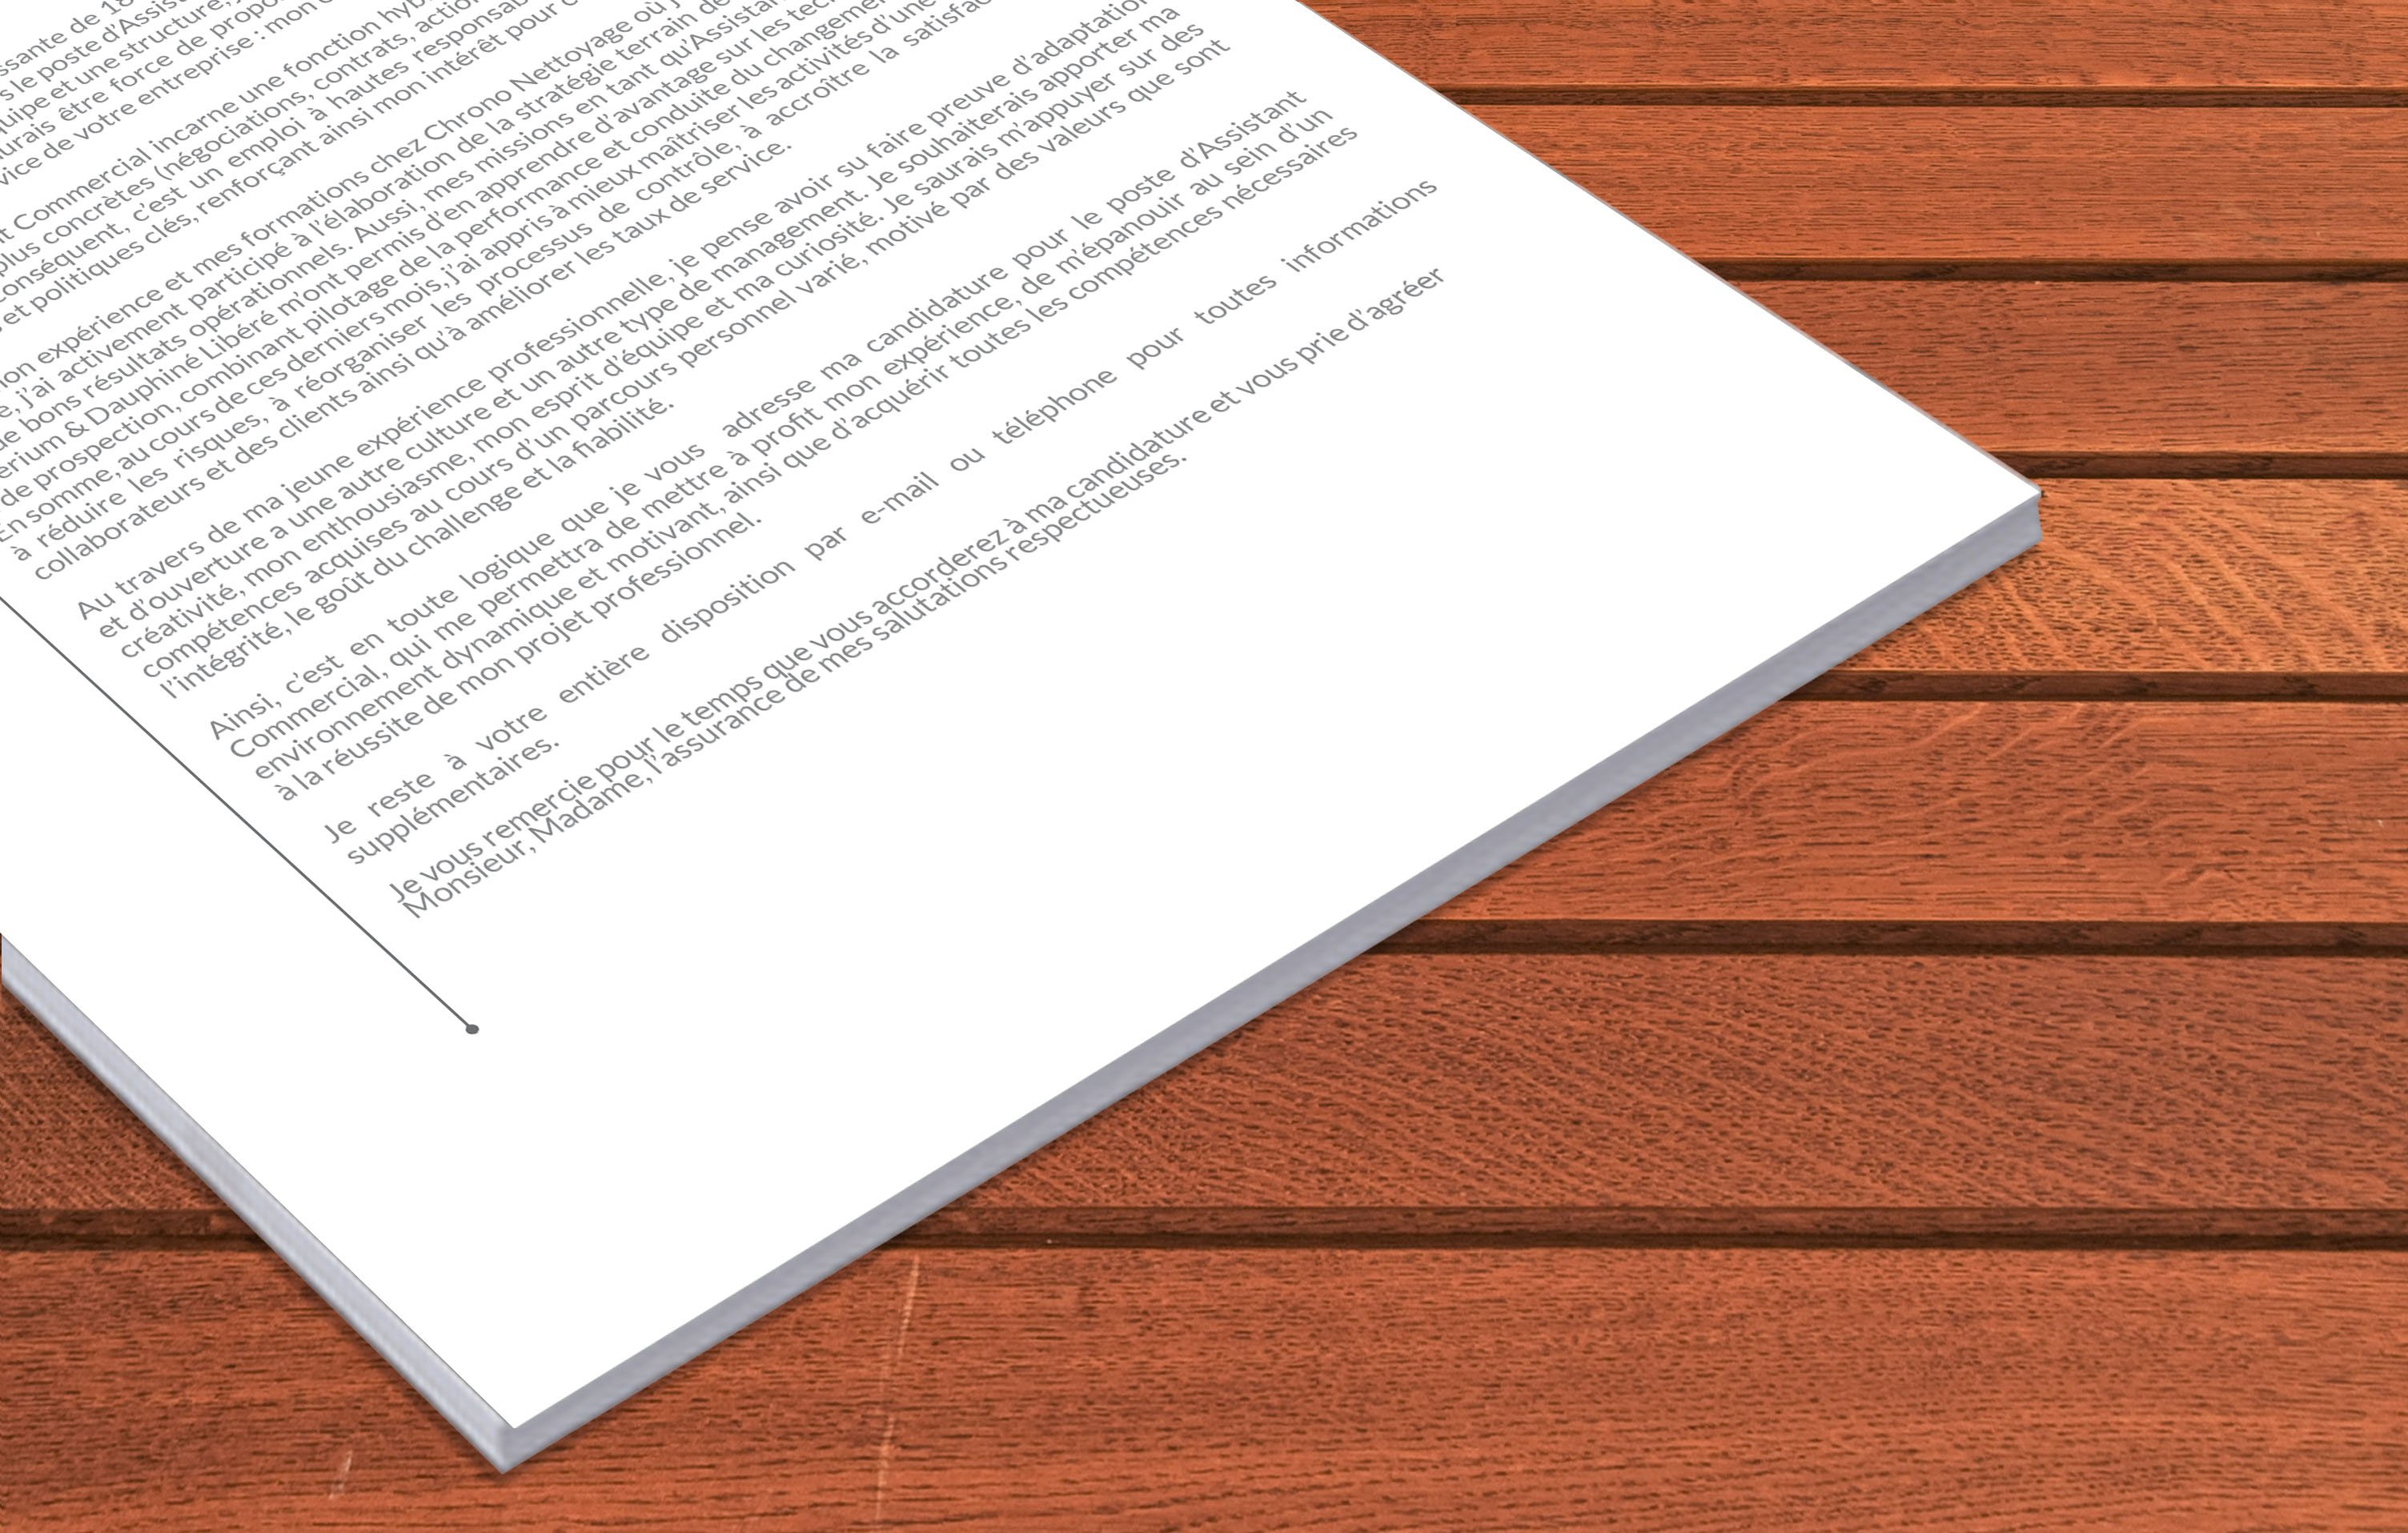 mycvfactory-cover-letter-la-bleuette-2_okMj2JX.jpg